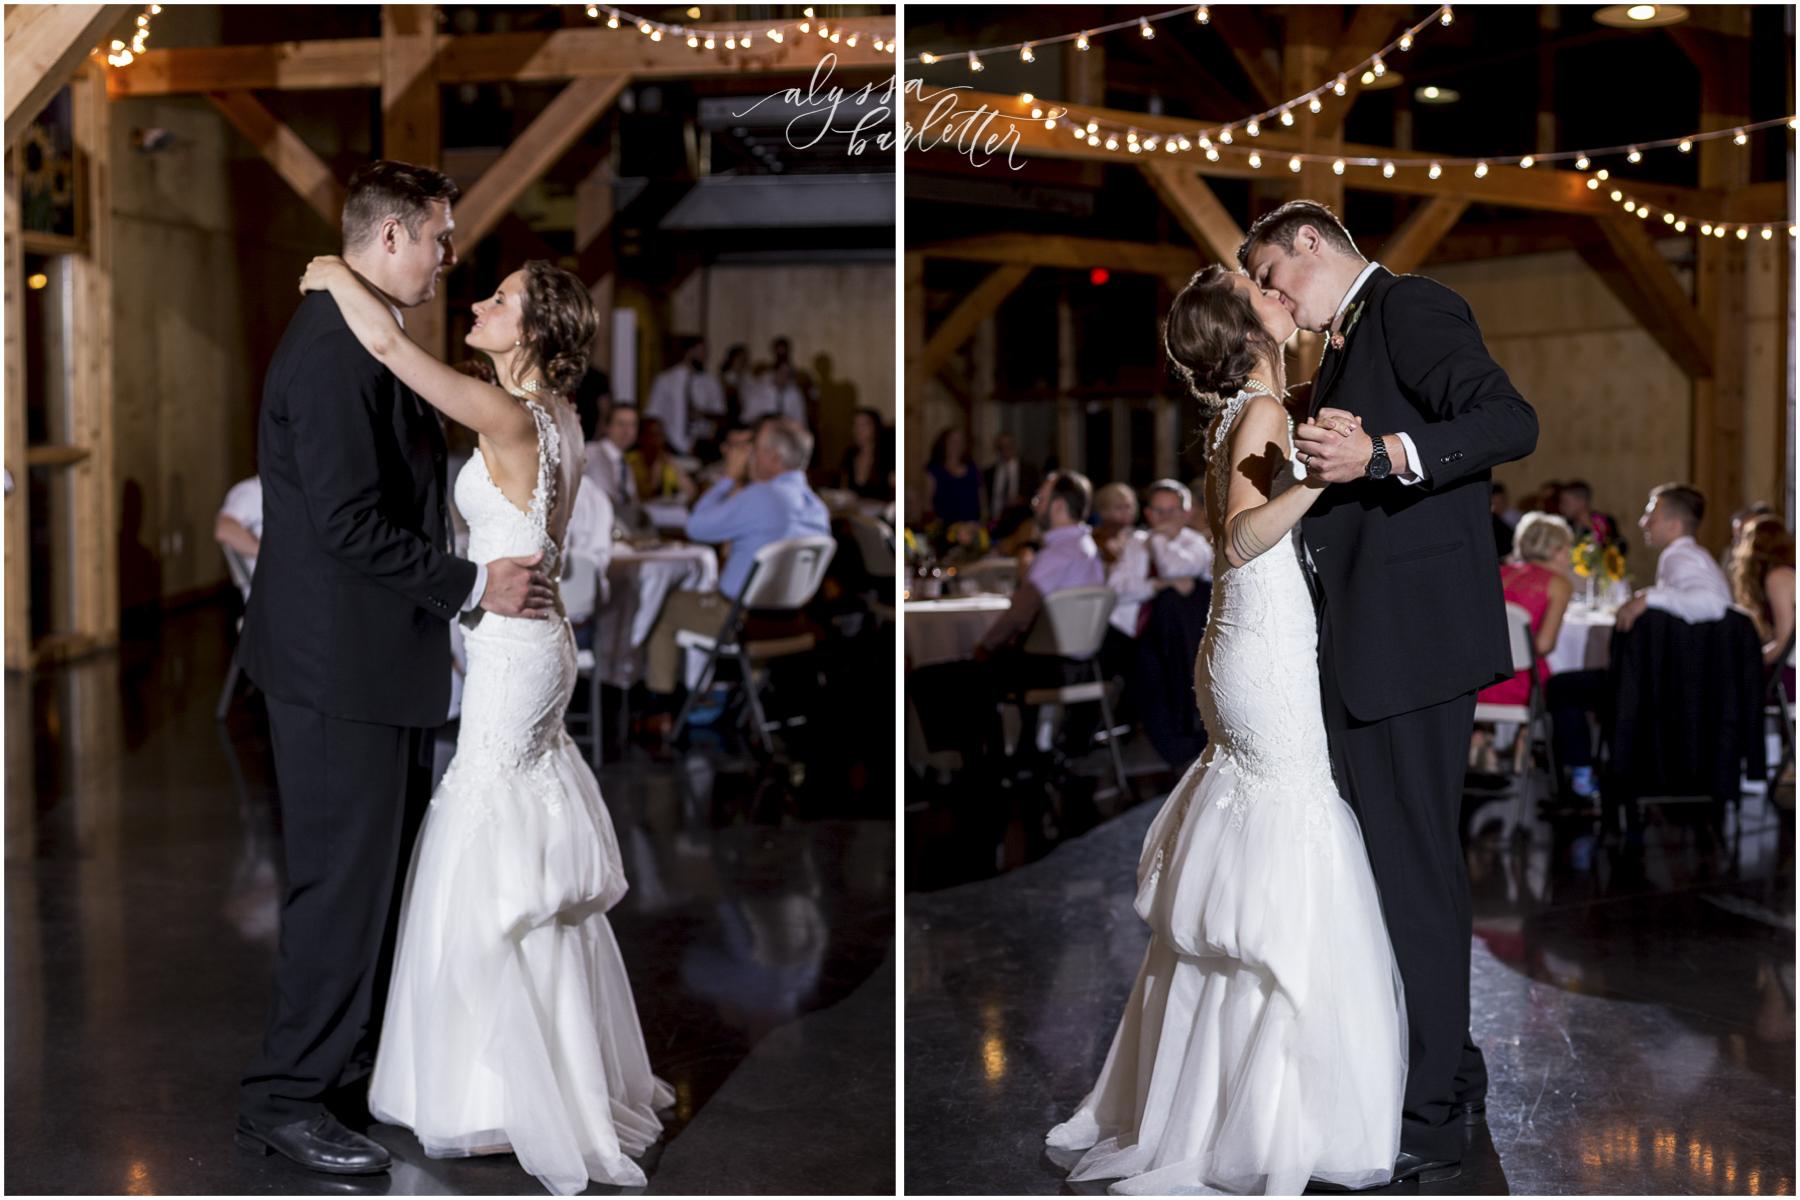 kansas city wedding budget mahaffie reception bride groom first dance